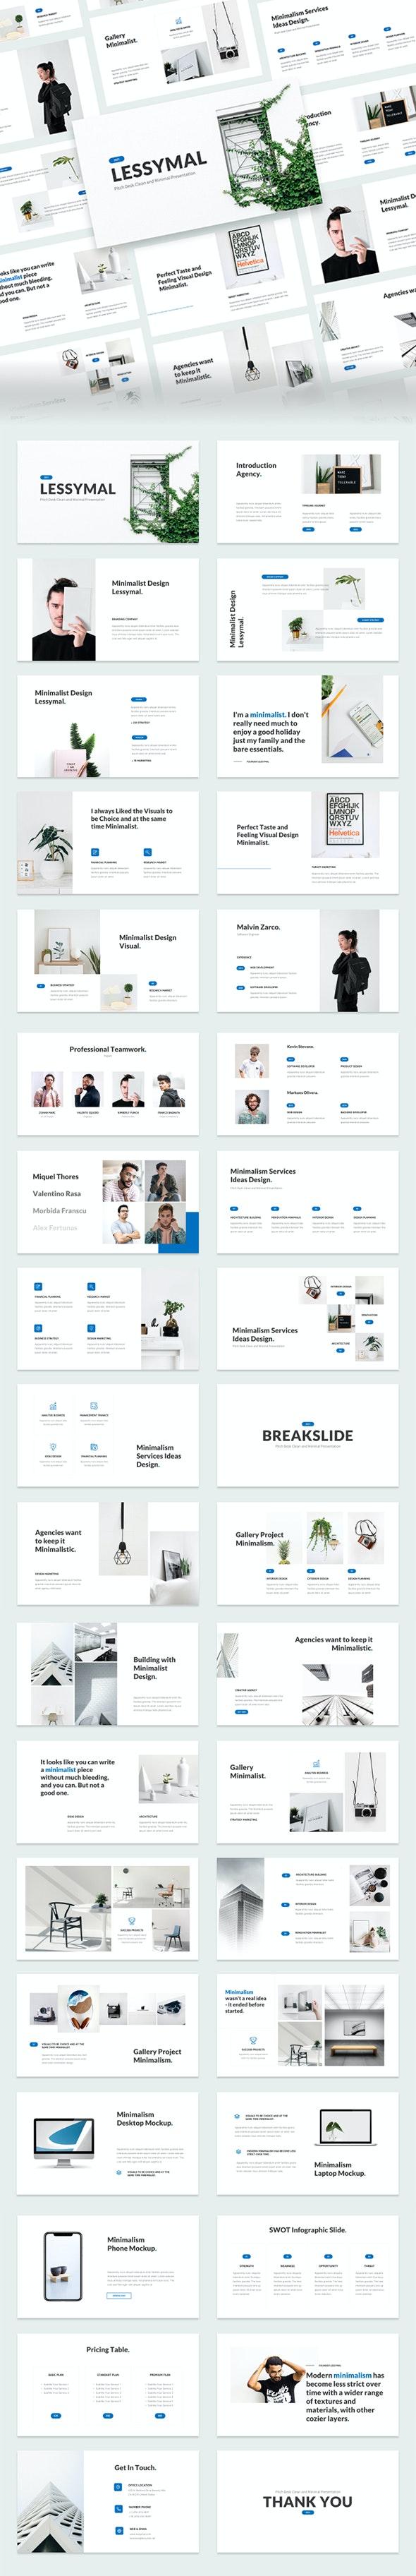 Lessymal - Minimalist Business PowerPoint Template - Business PowerPoint Templates